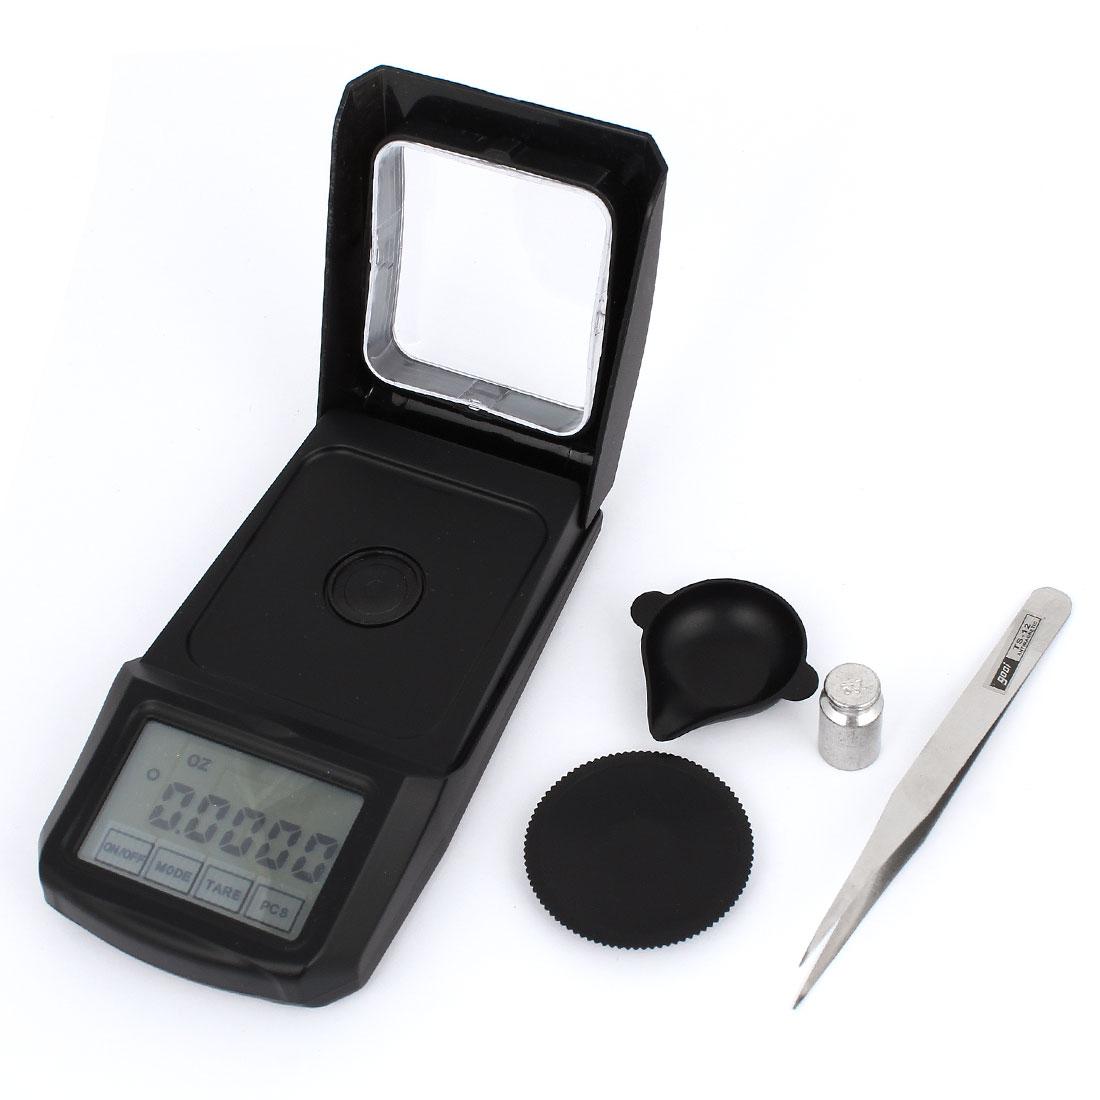 Handy 0.001g x 20g Jewelry Weight Balance Digital Pocket Scale Black